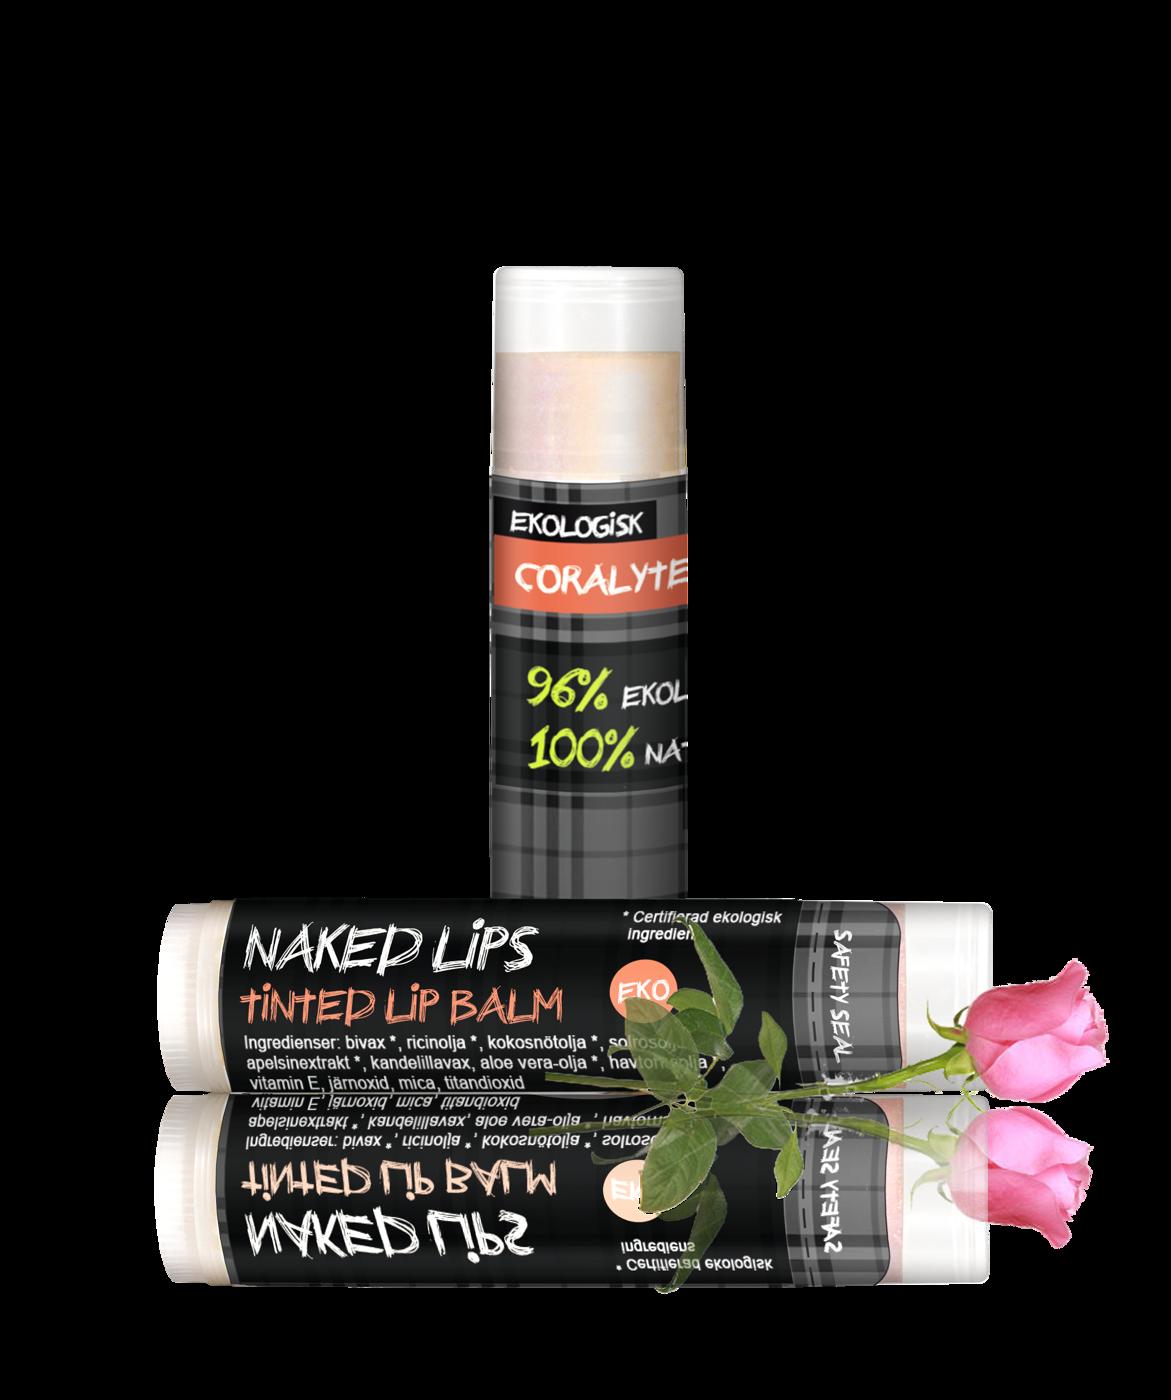 Naked Lips, Coralyte w rose April14